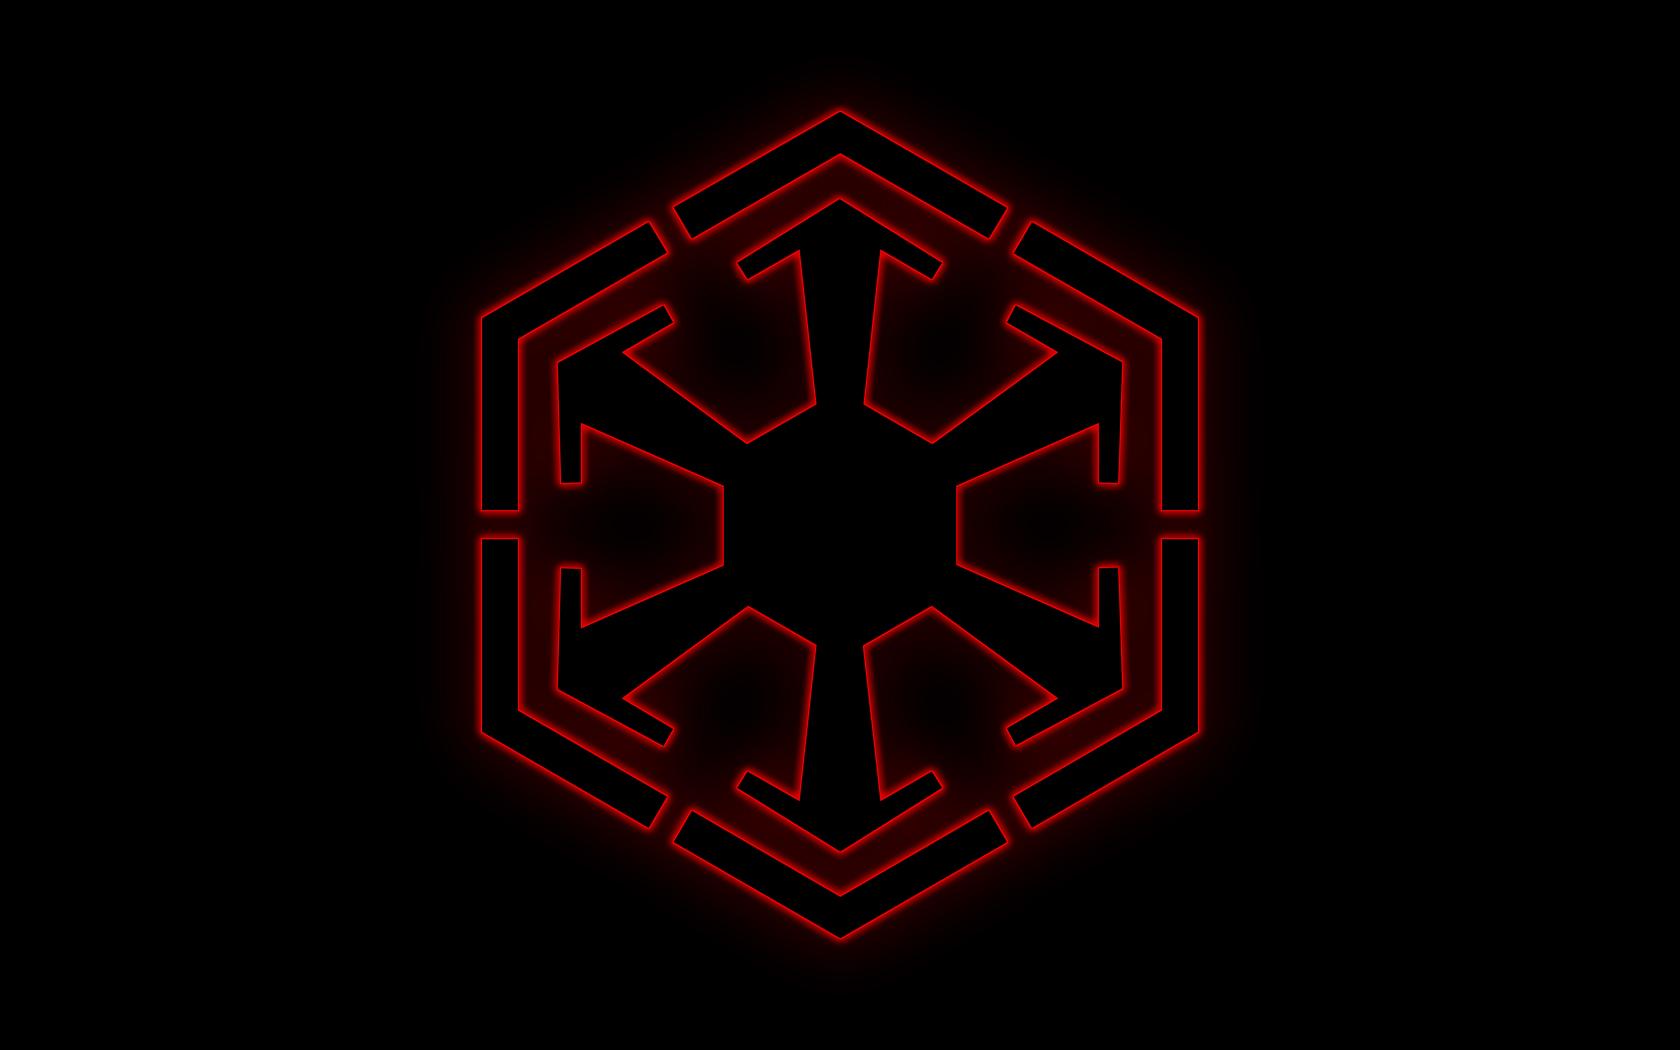 Empire Logo Swtor Star Wars Sith ...